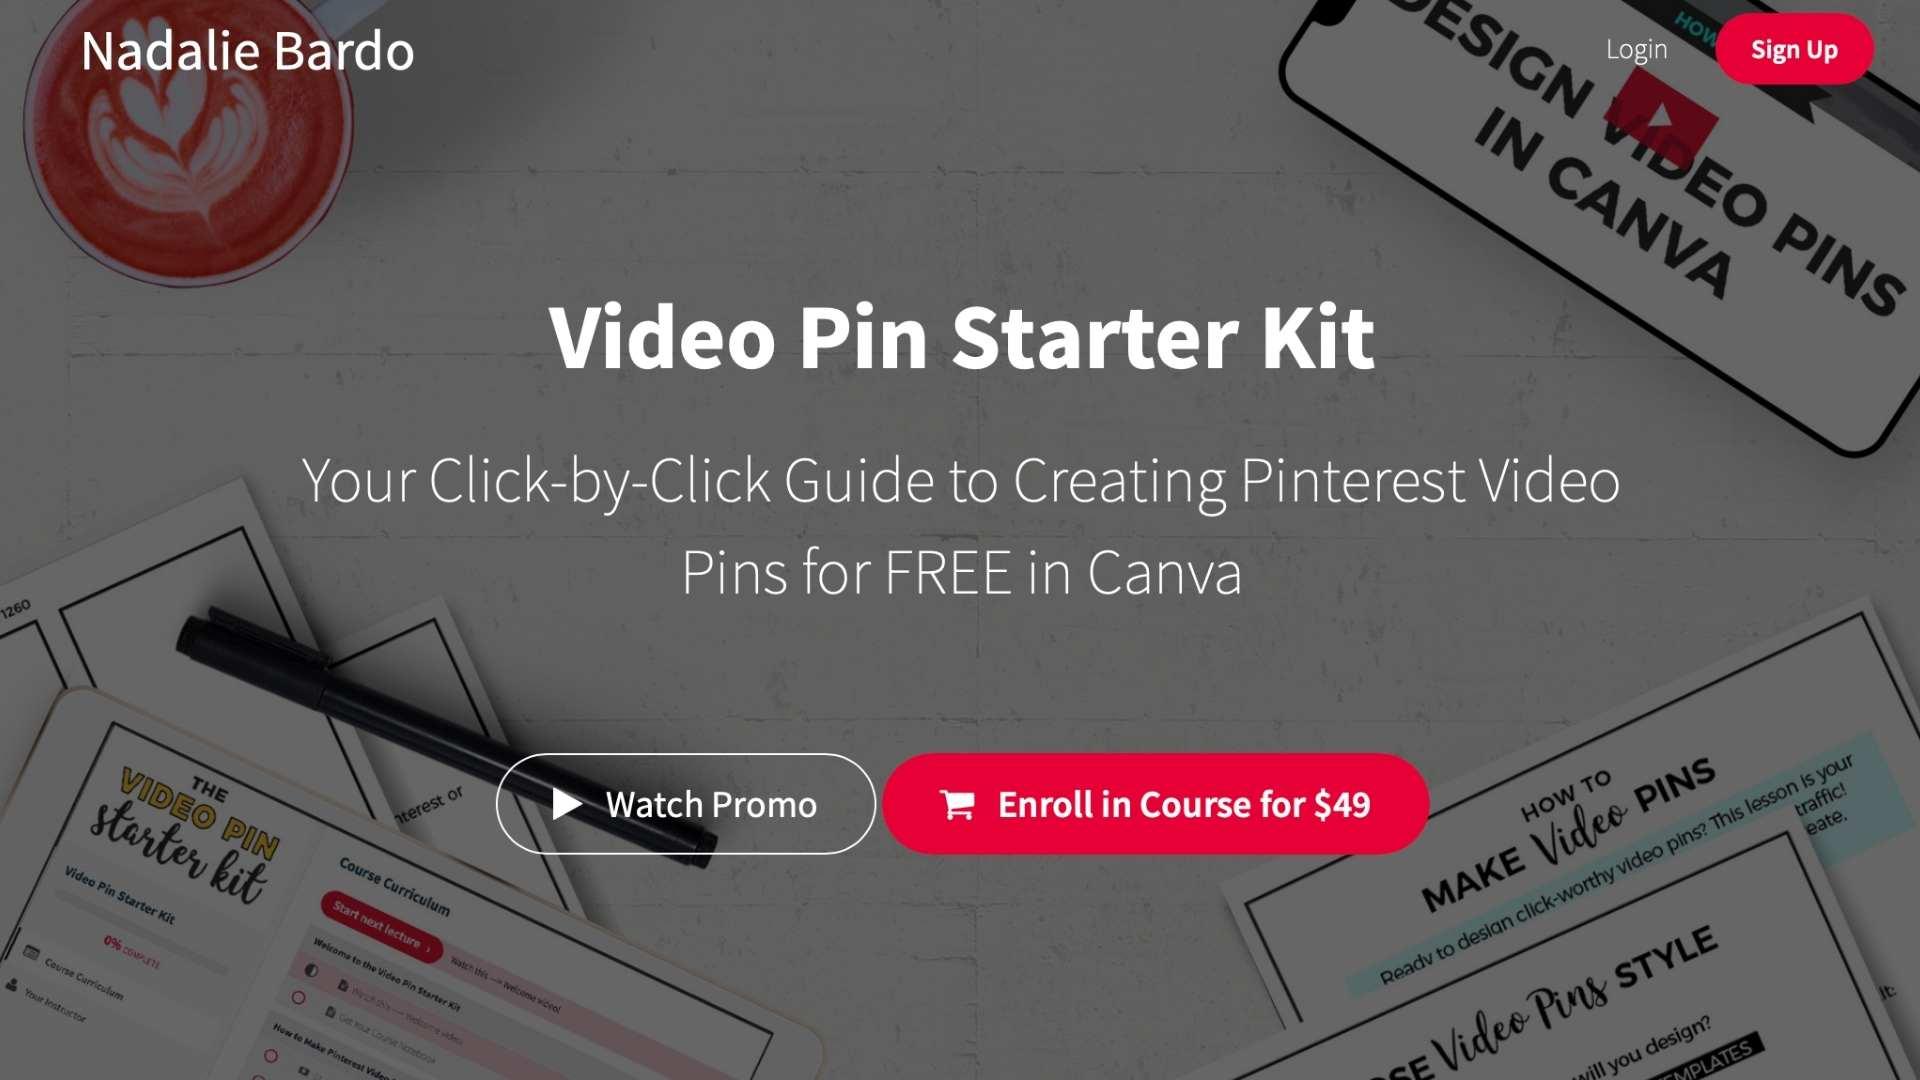 The Video Pin Starter Kit